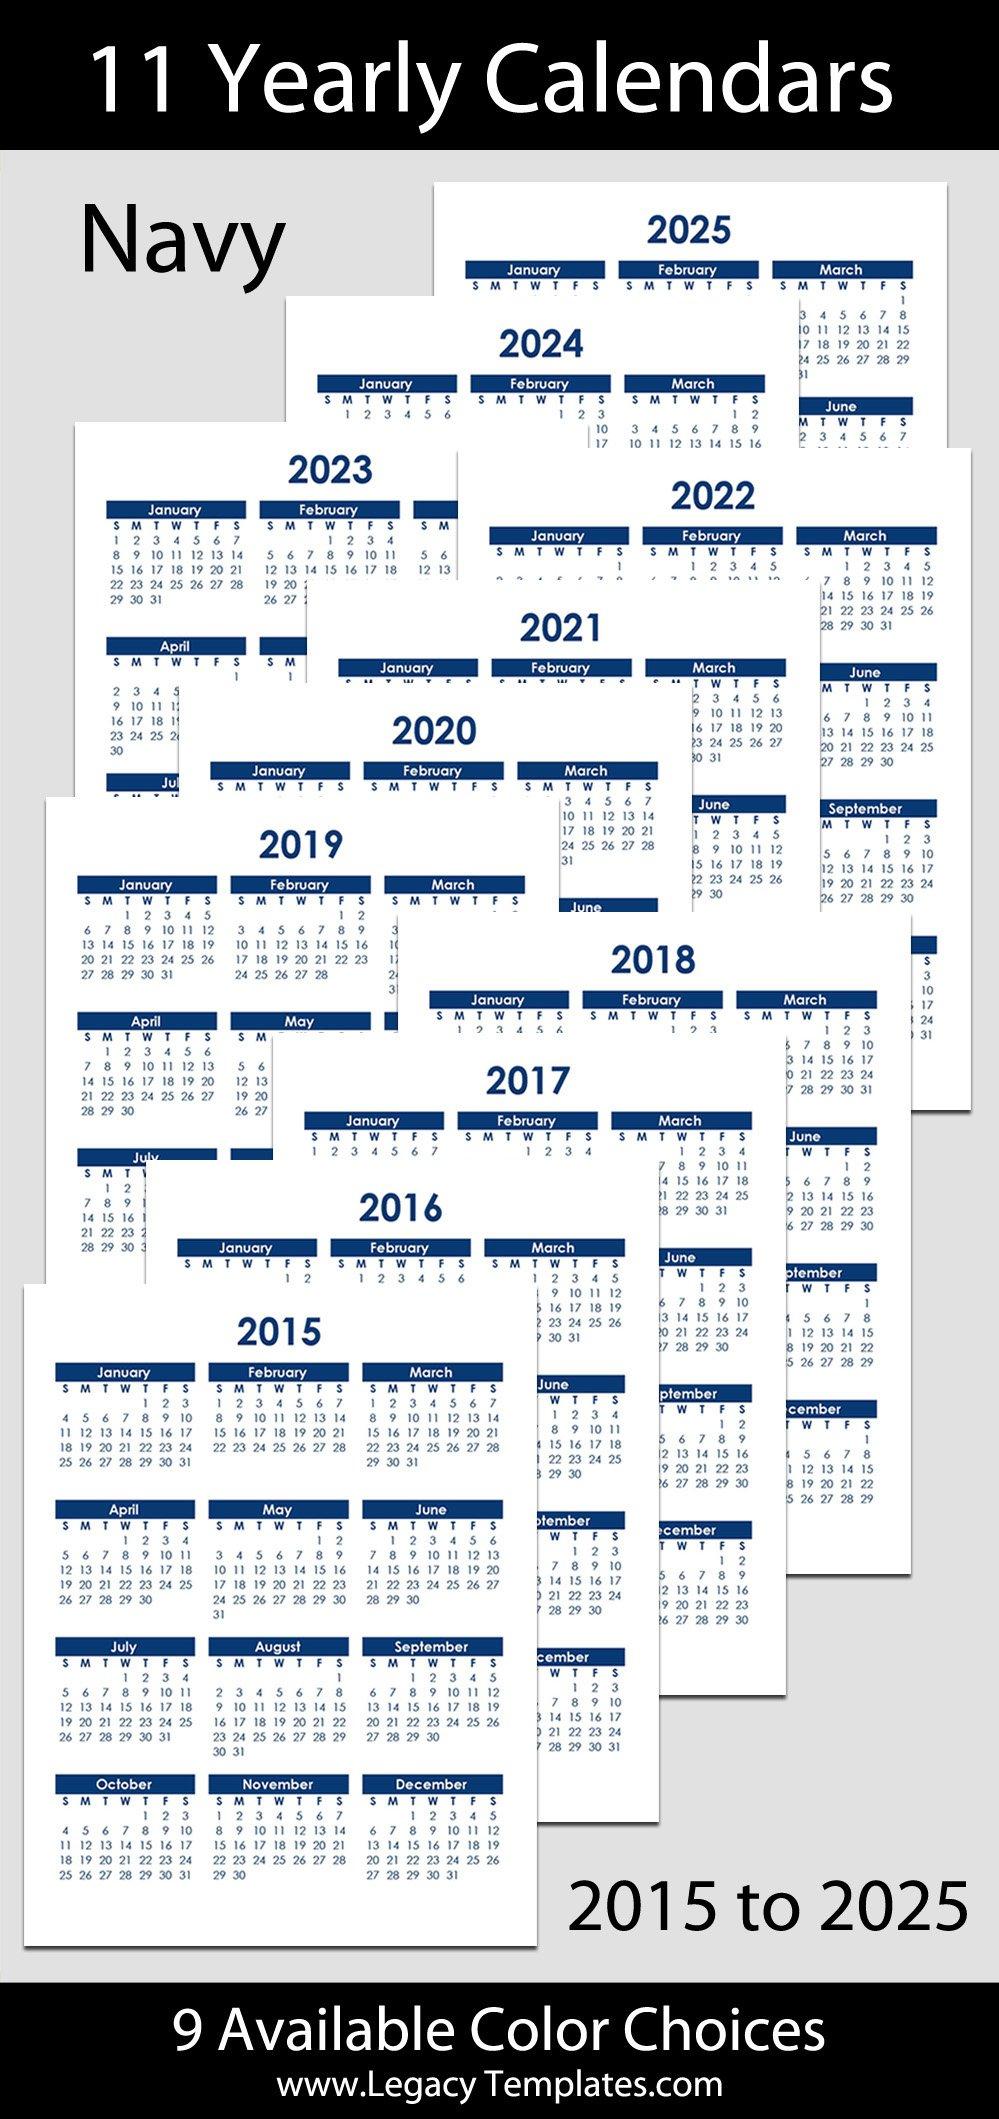 "2015 To 2025 Yearly Calendar - 8 1/2"" X 11"" | Legacy Templates Printable 2020 Calendar 8 1/2 X 11"